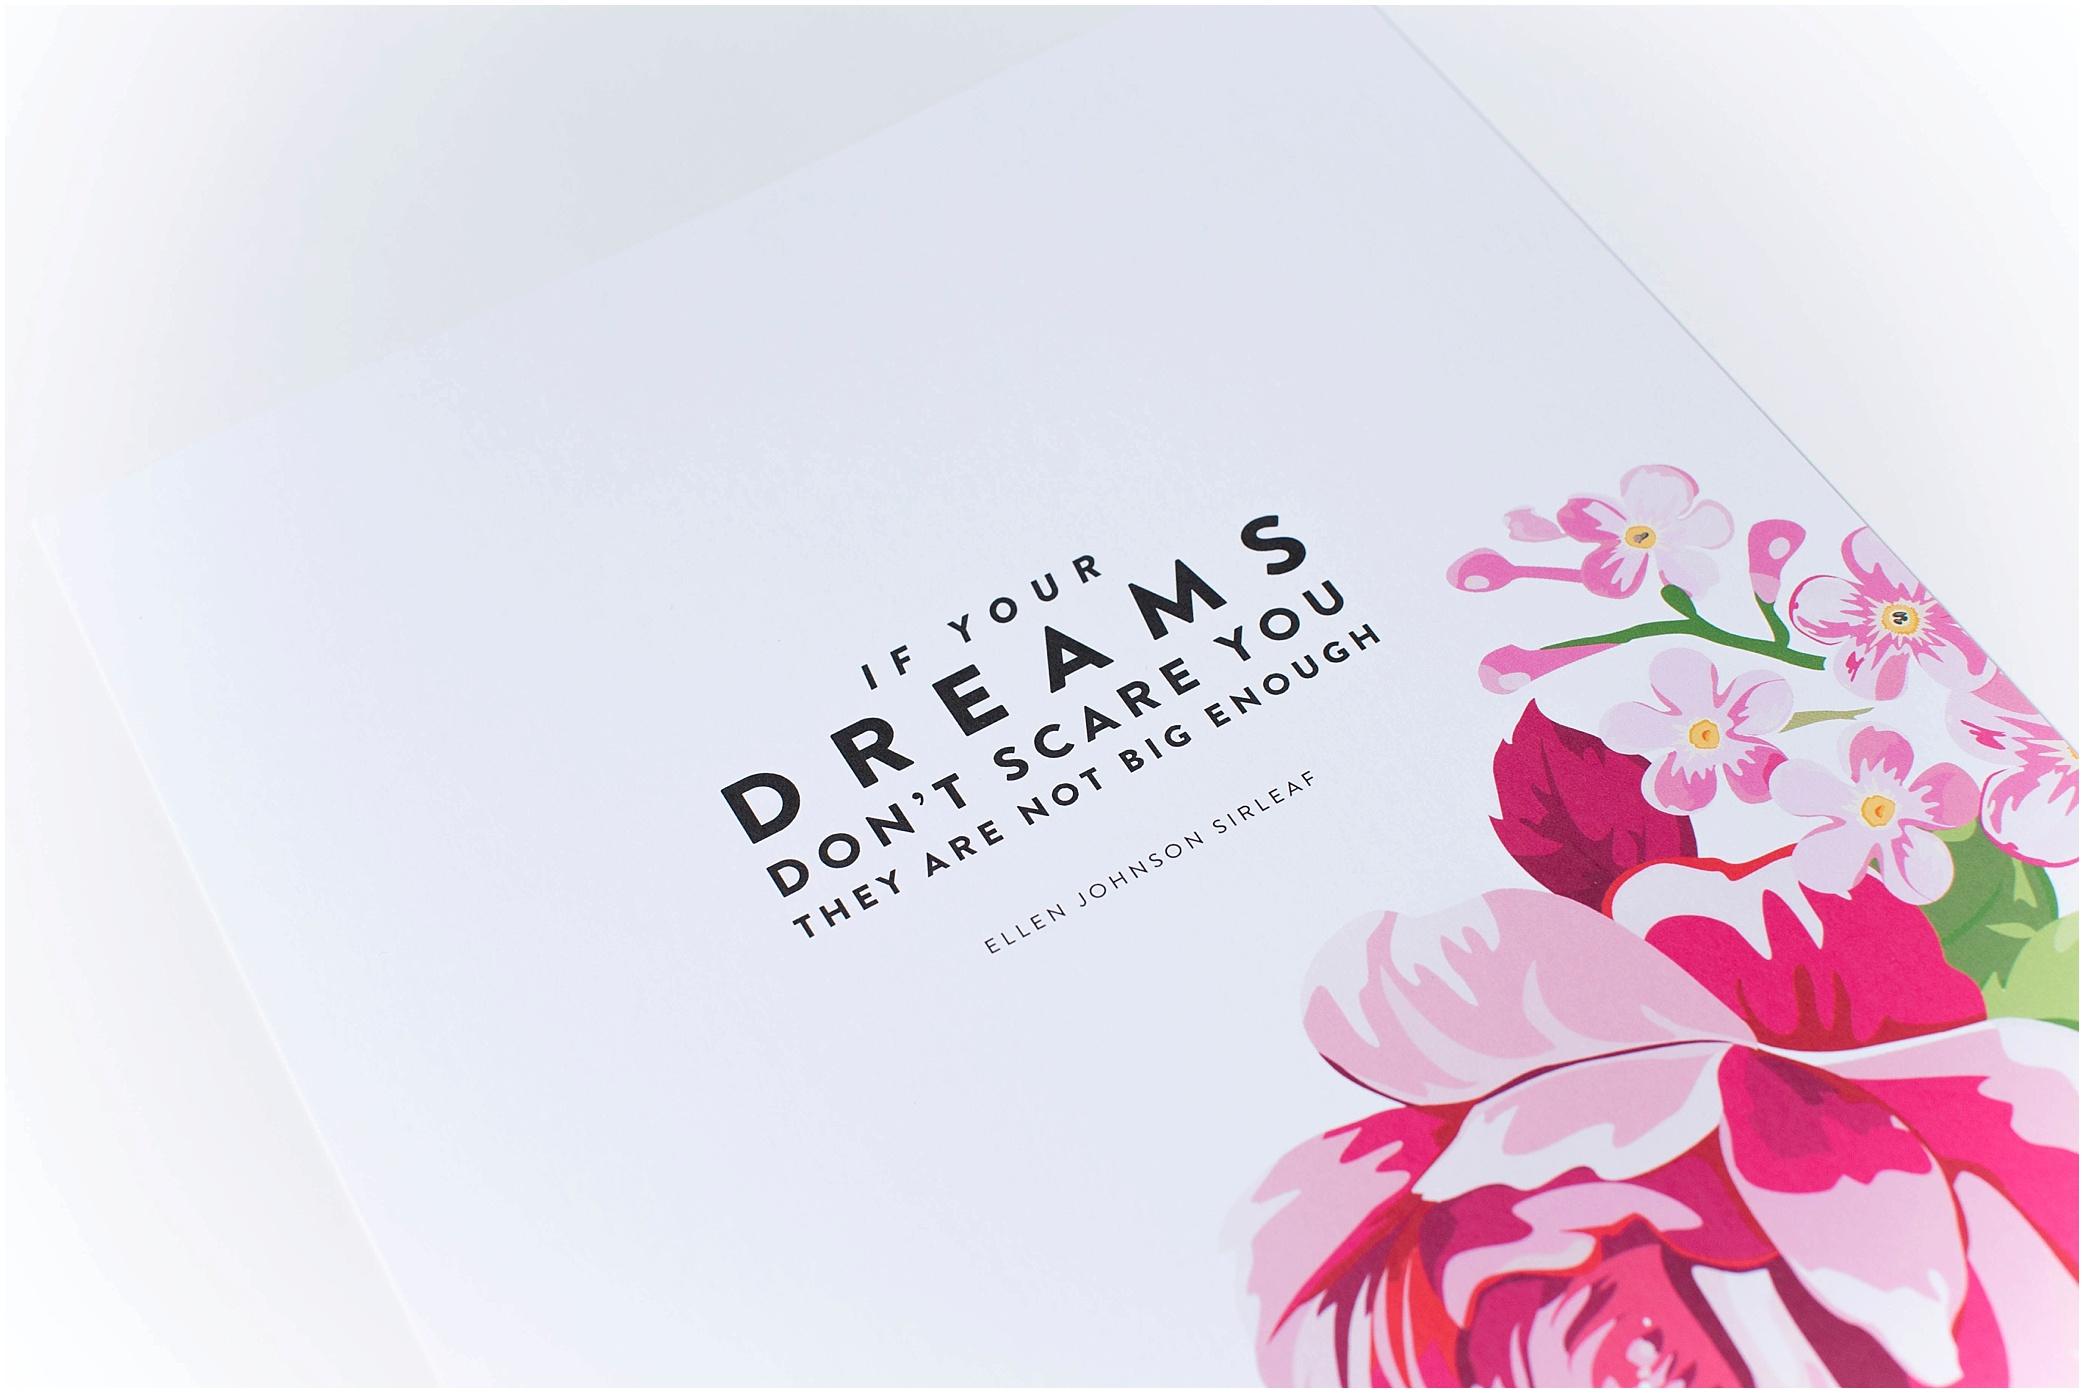 Business Goals Blog Post [SOURCE: http://www.ashleypowellphotography.com/blog/2015/1/21/2015-goals-personal ]